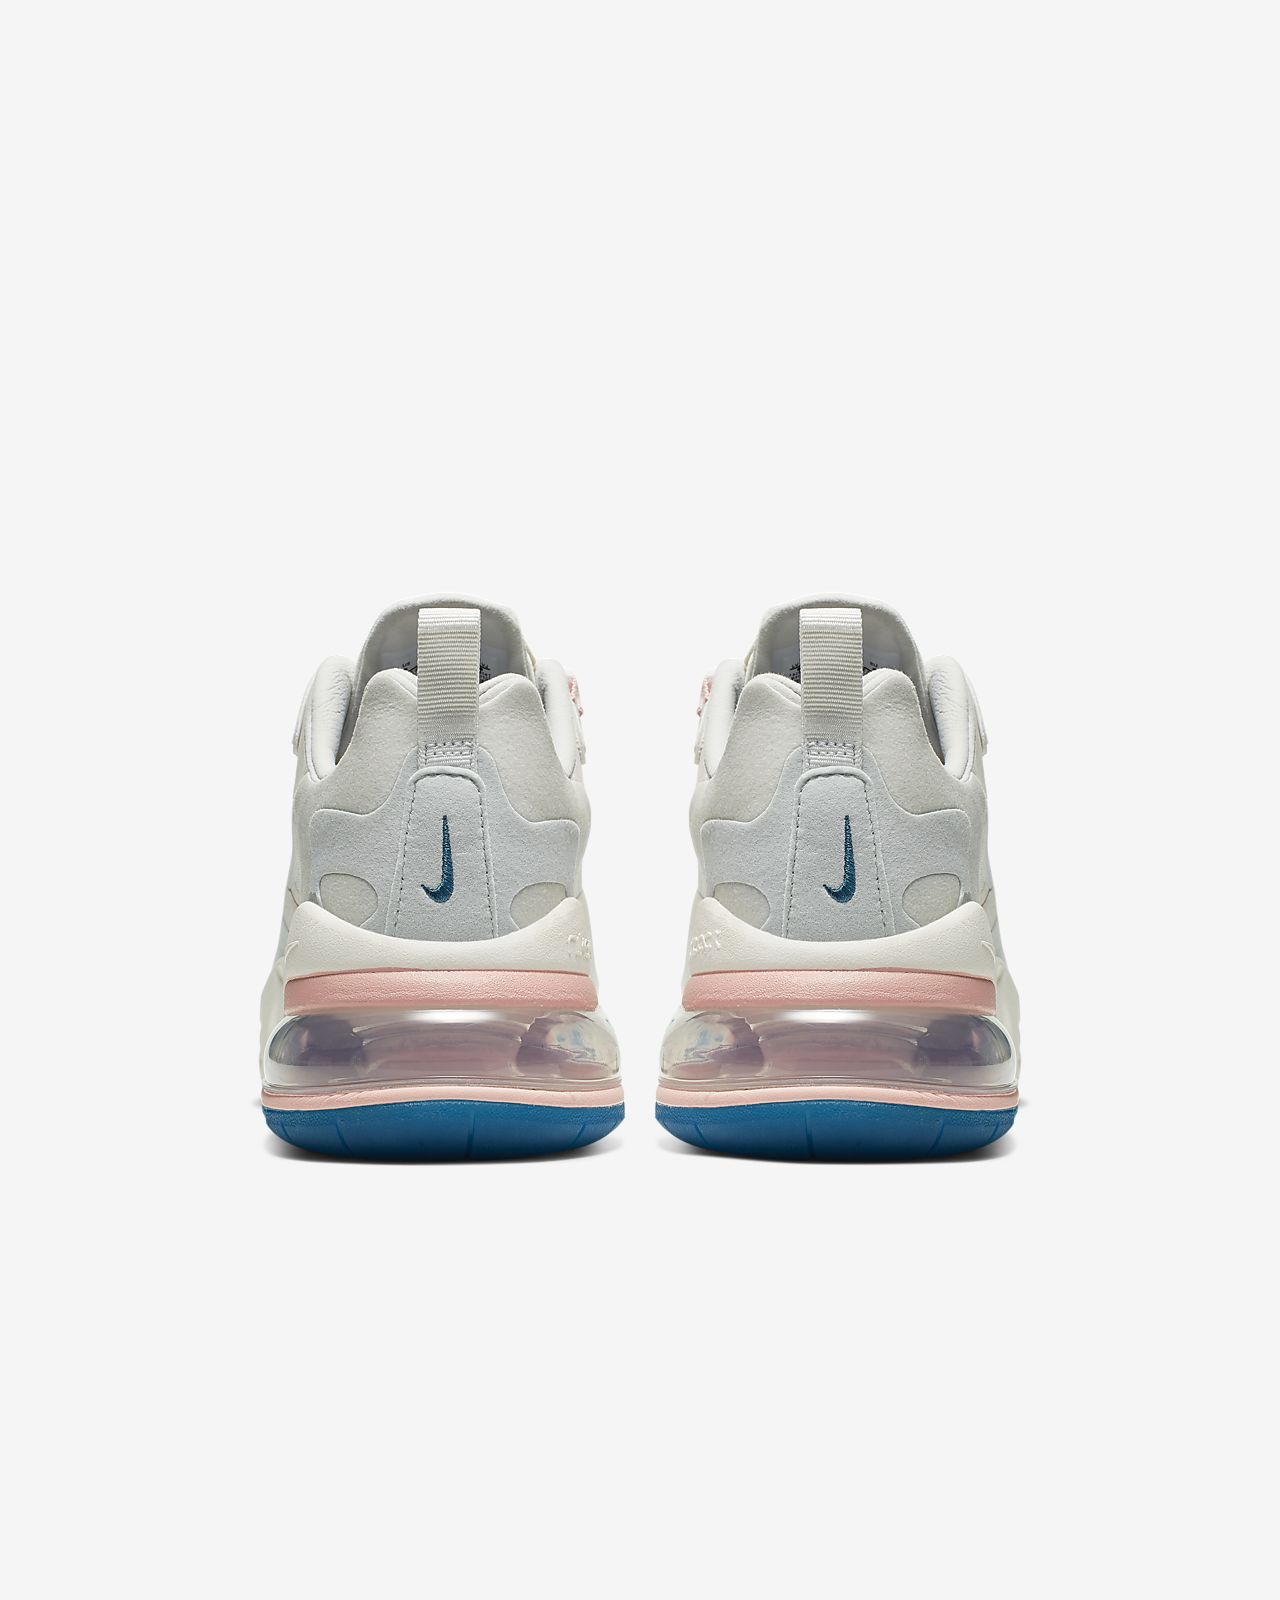 Nike Air Max 270 Flyknit Women Sneaker Trainer (6.5 B(M) US